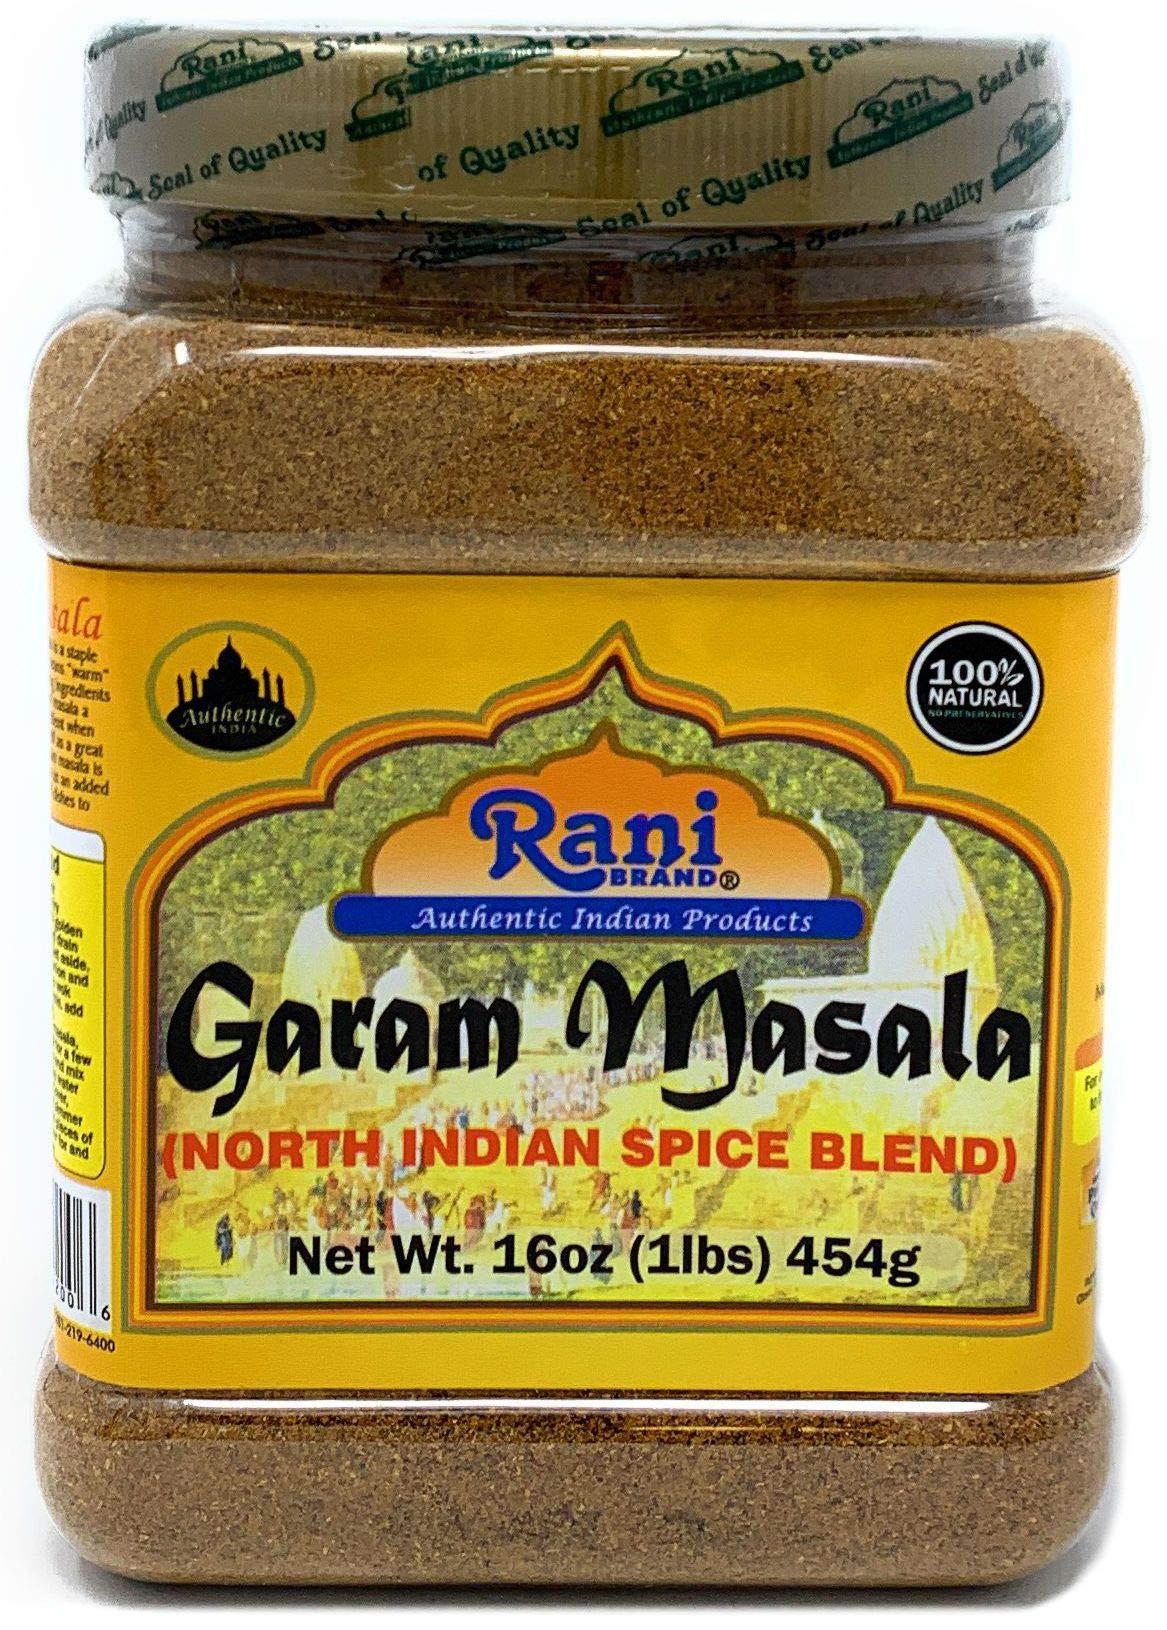 Rani Garam Masala Indian 11-Spice Blend 1lb (16oz) 454g ~ All Natural, Salt-Free   Vegan   No Colors   Gluten Friendly   NON-GMO   Indian Origin